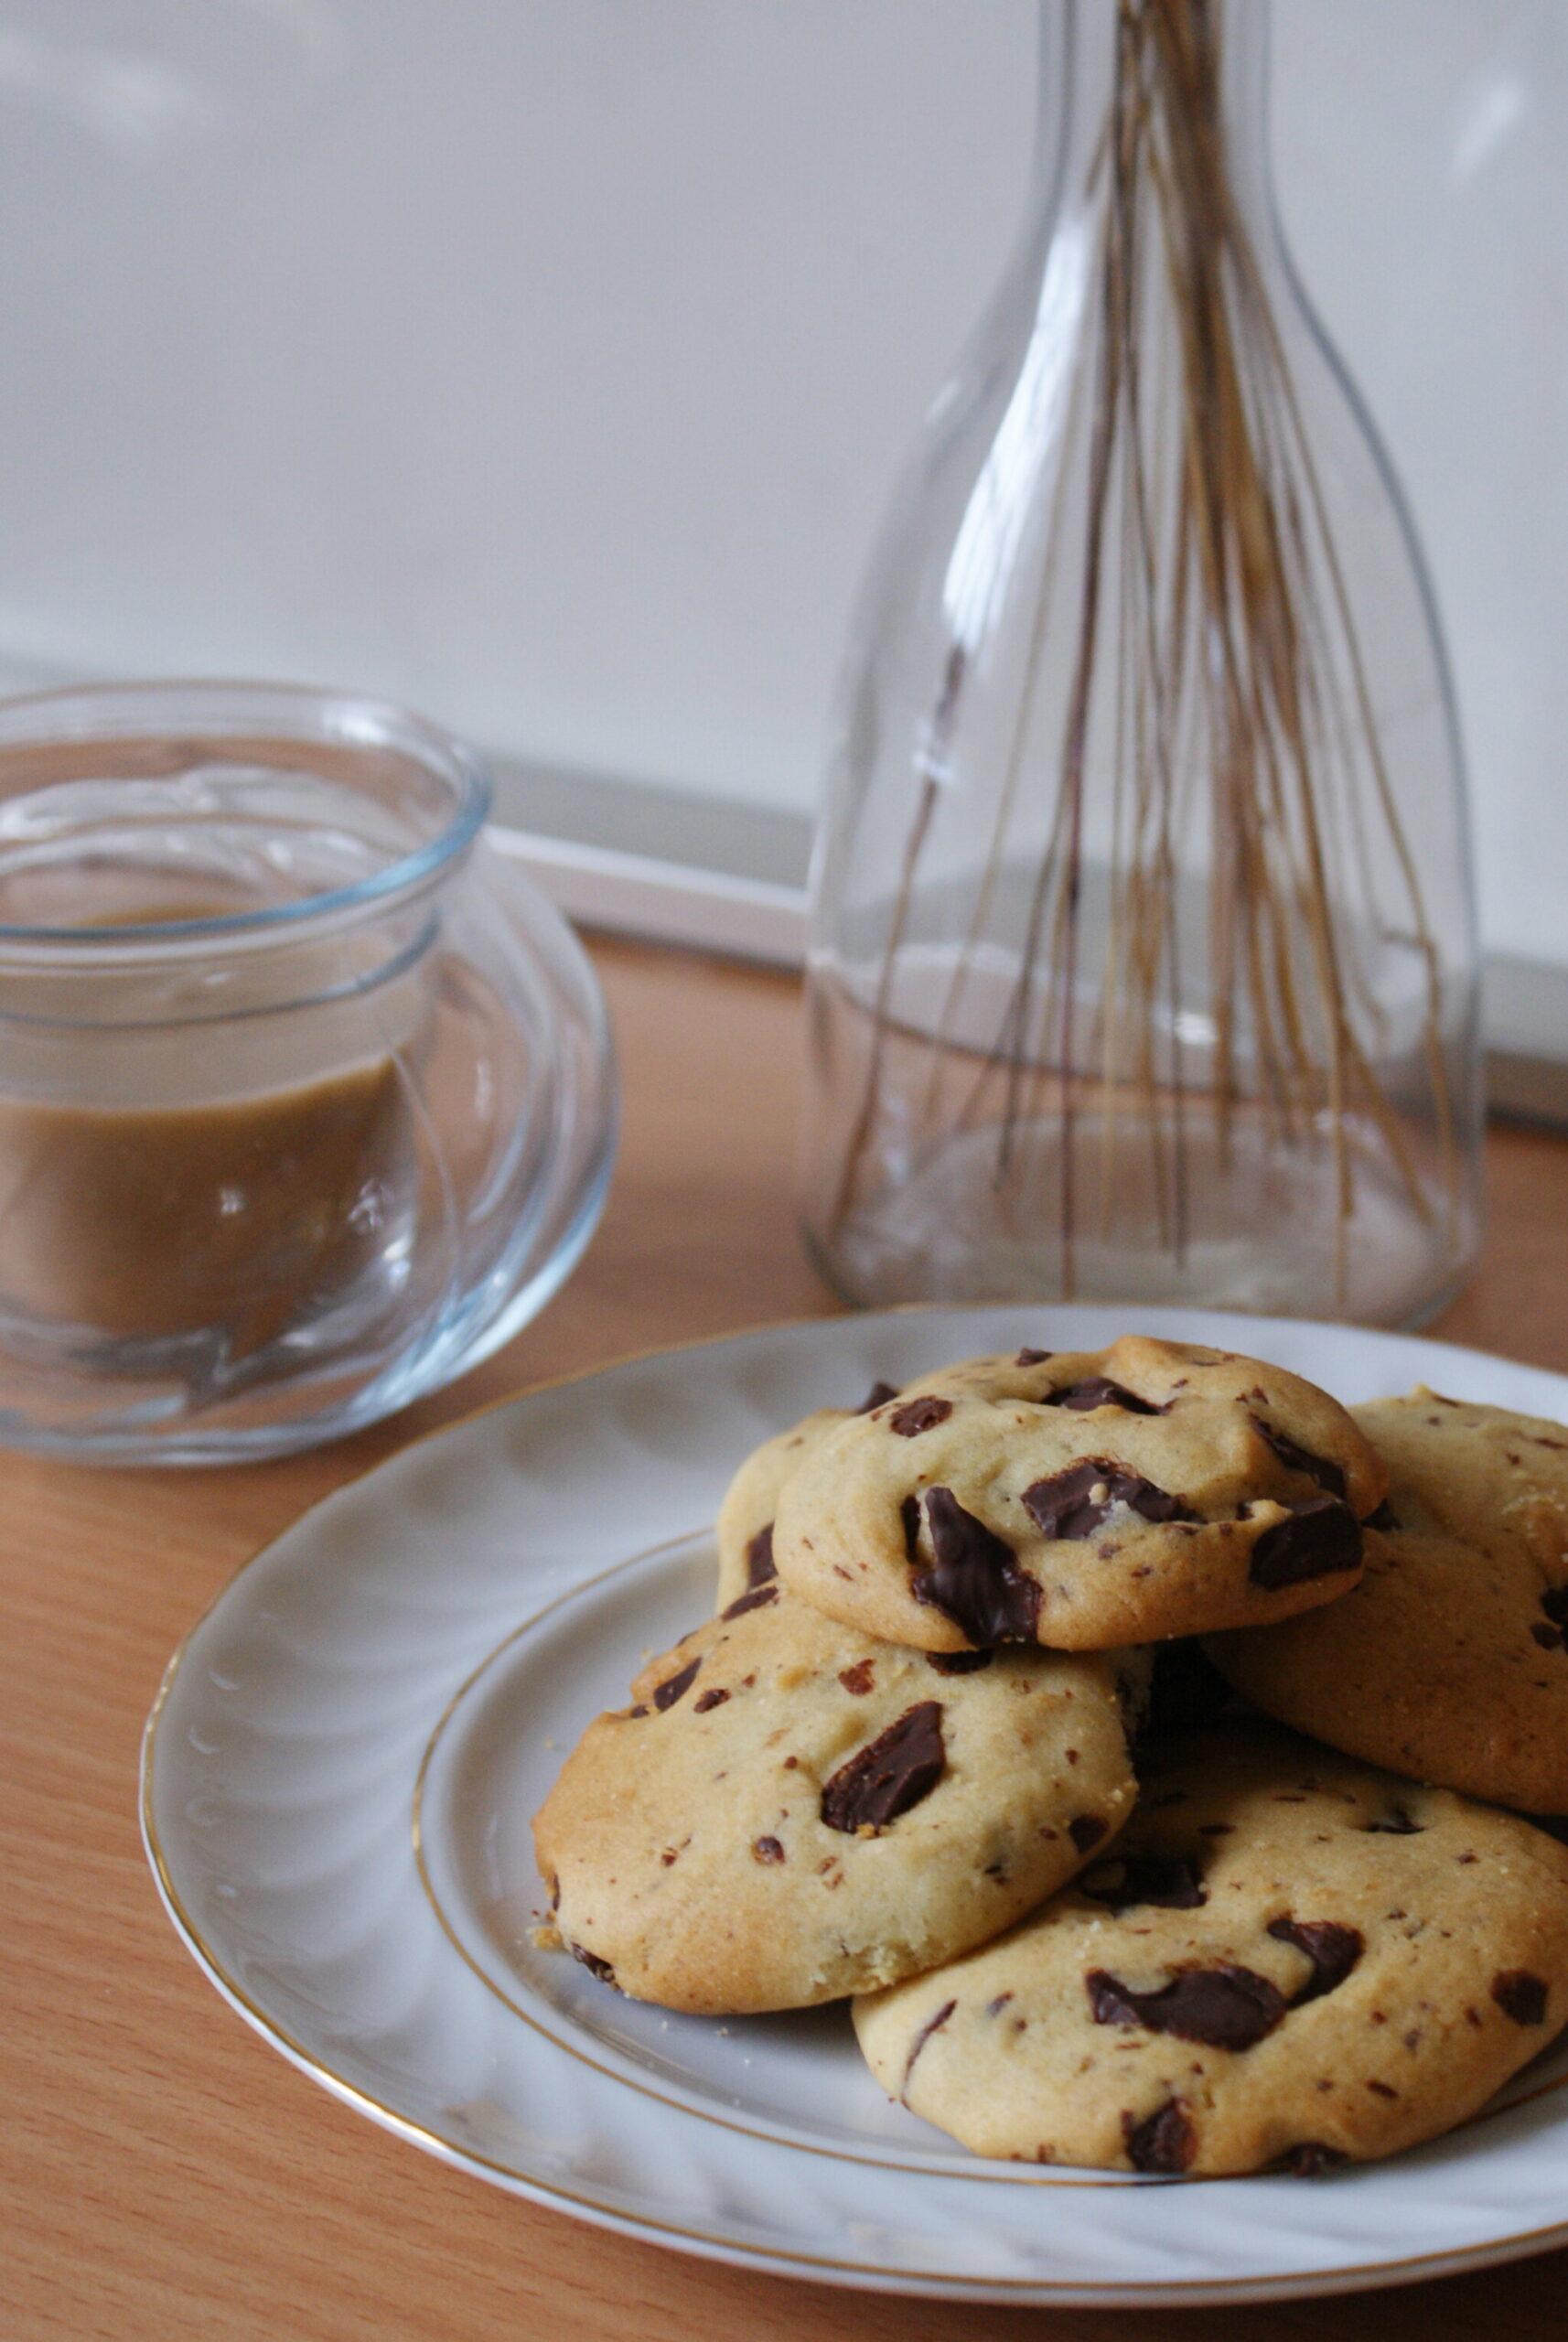 best easy vegan chocolate chips cookies recipe healthy bake quick 20 minute plant based ultimate francinesplaceblog traditional american